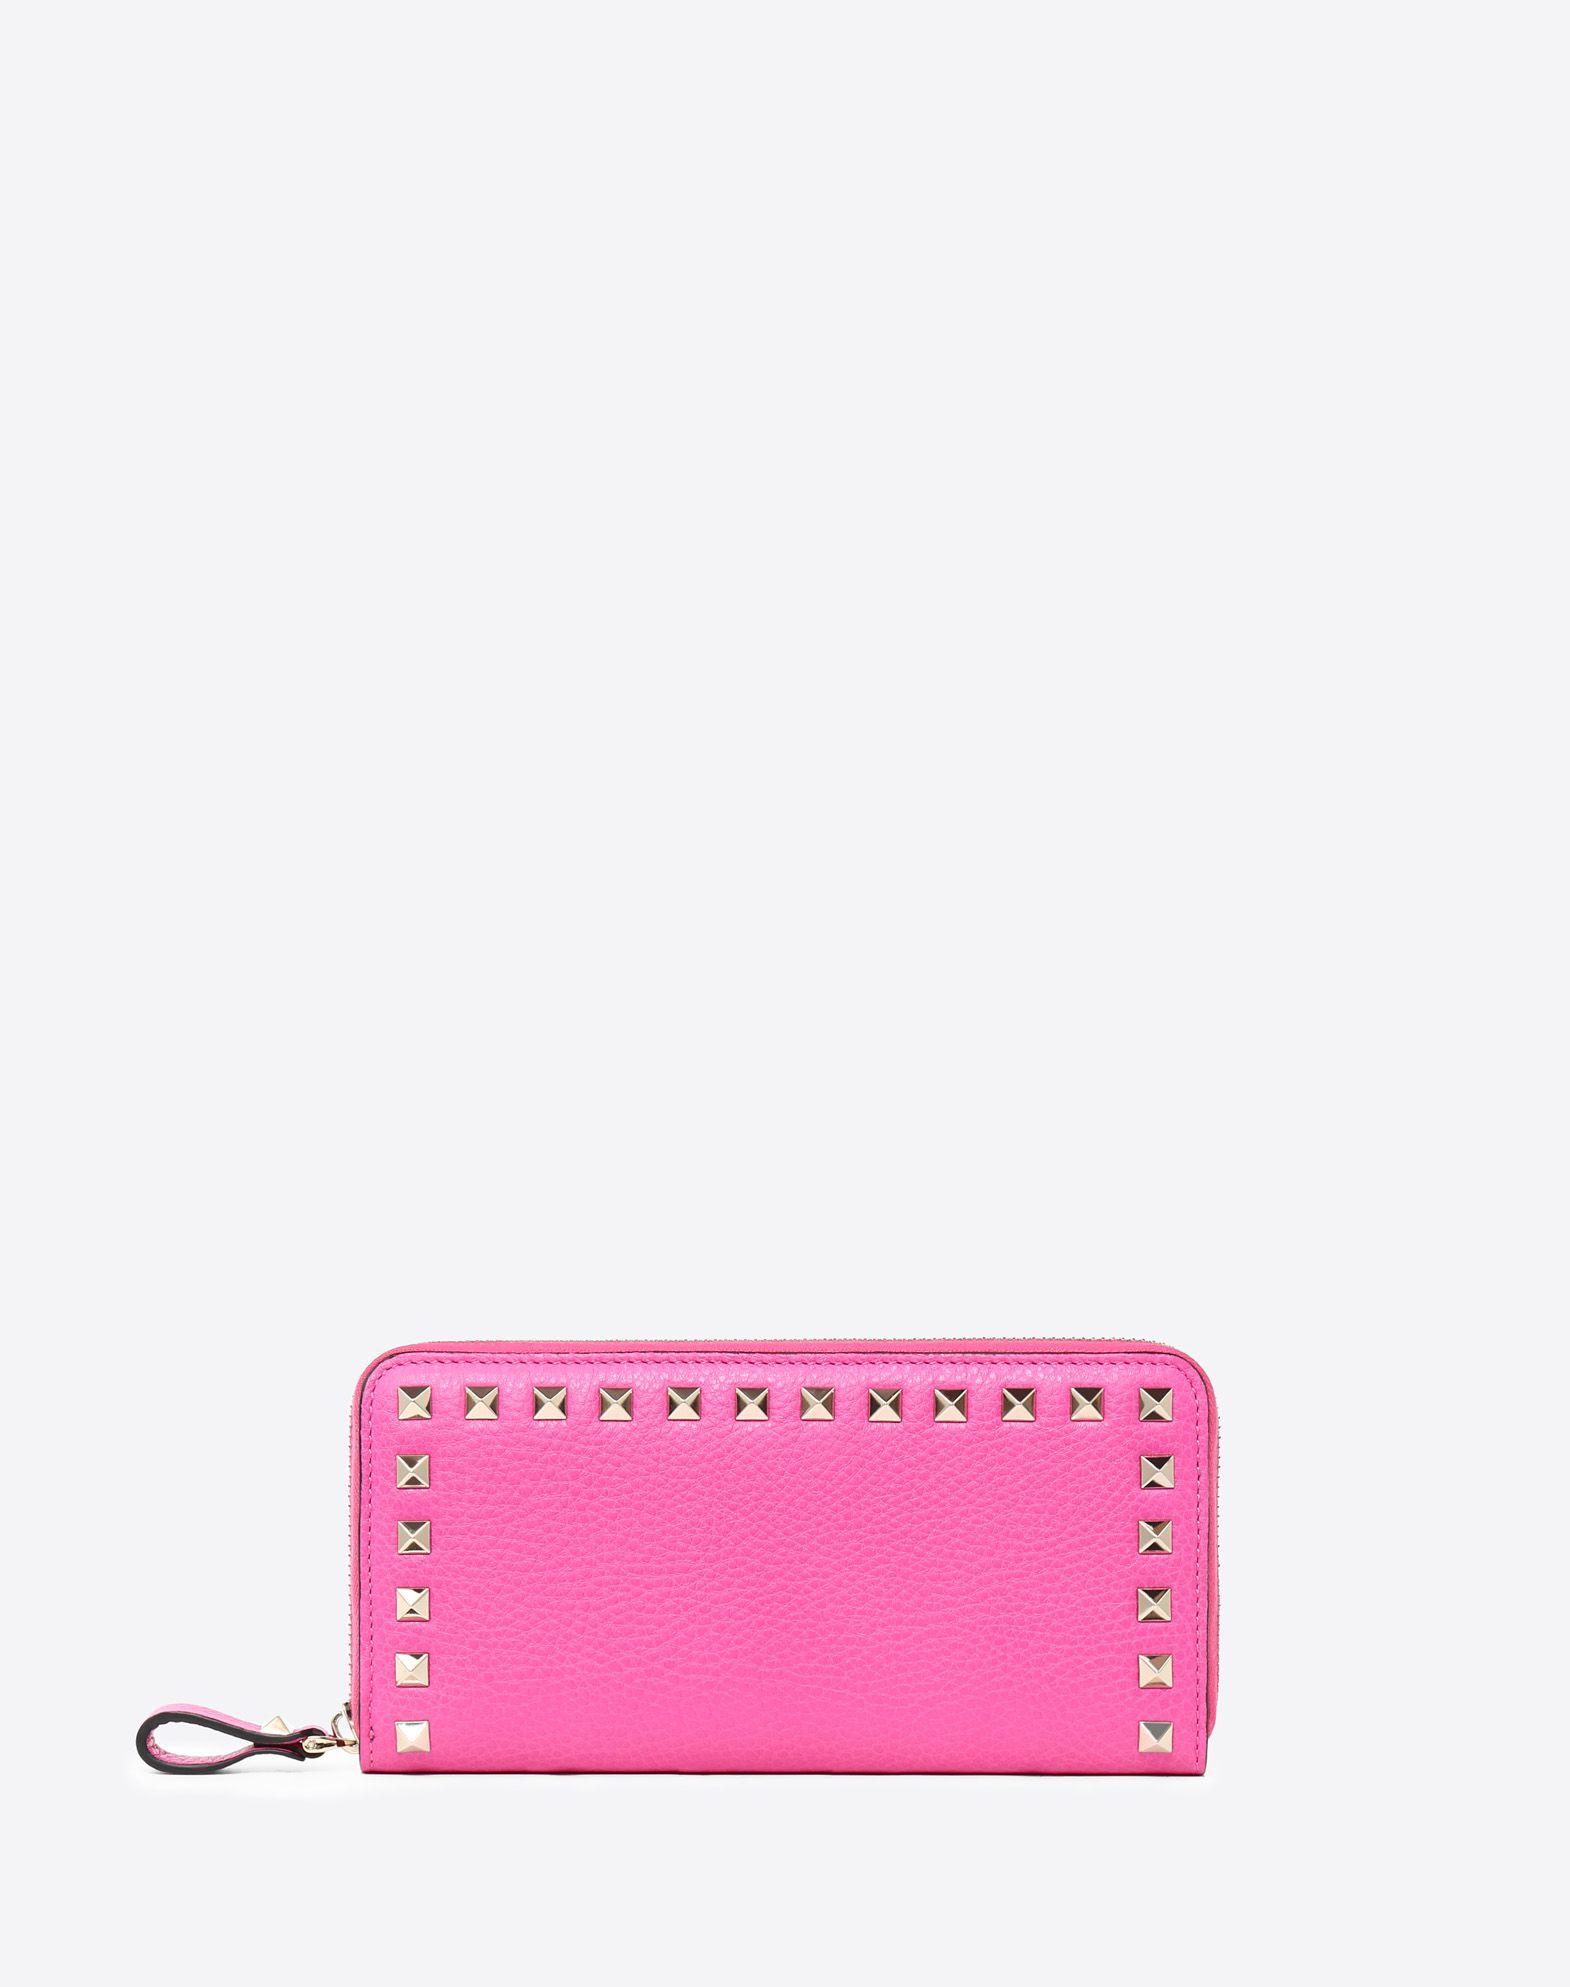 VALENTINO GARAVANI Rockstud Zipped Wallet ZIP AROUND WALLETS D f